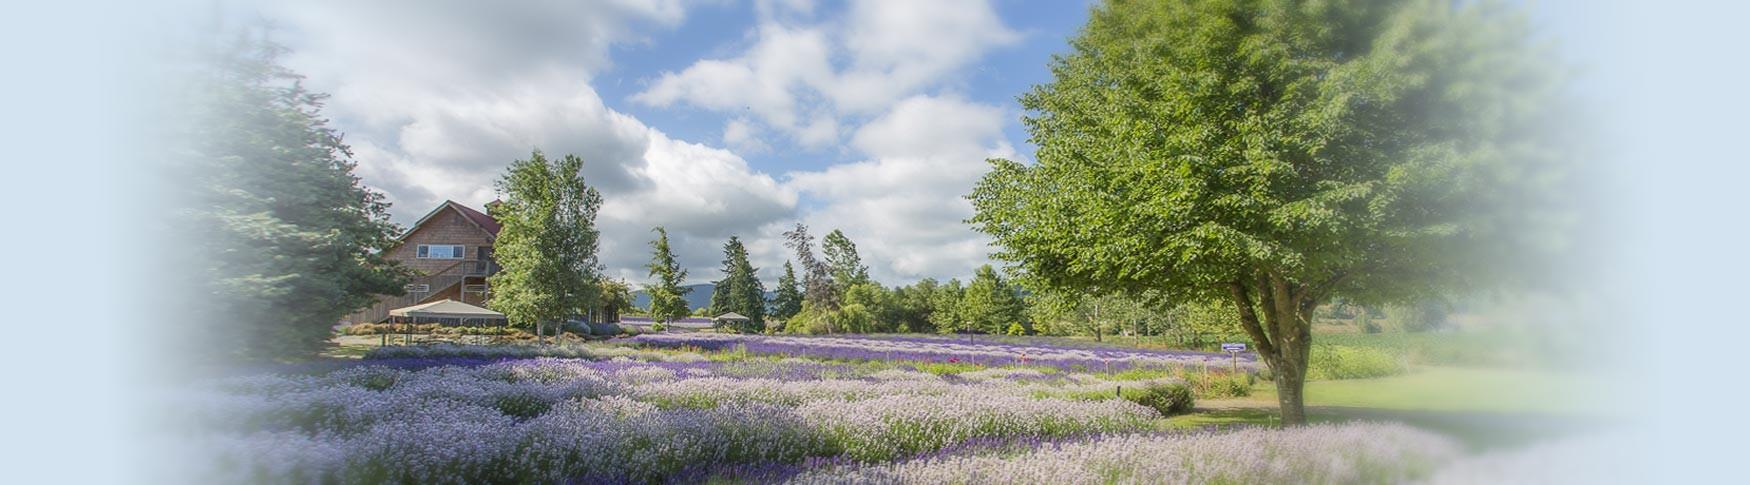 Purple Haze Lavender